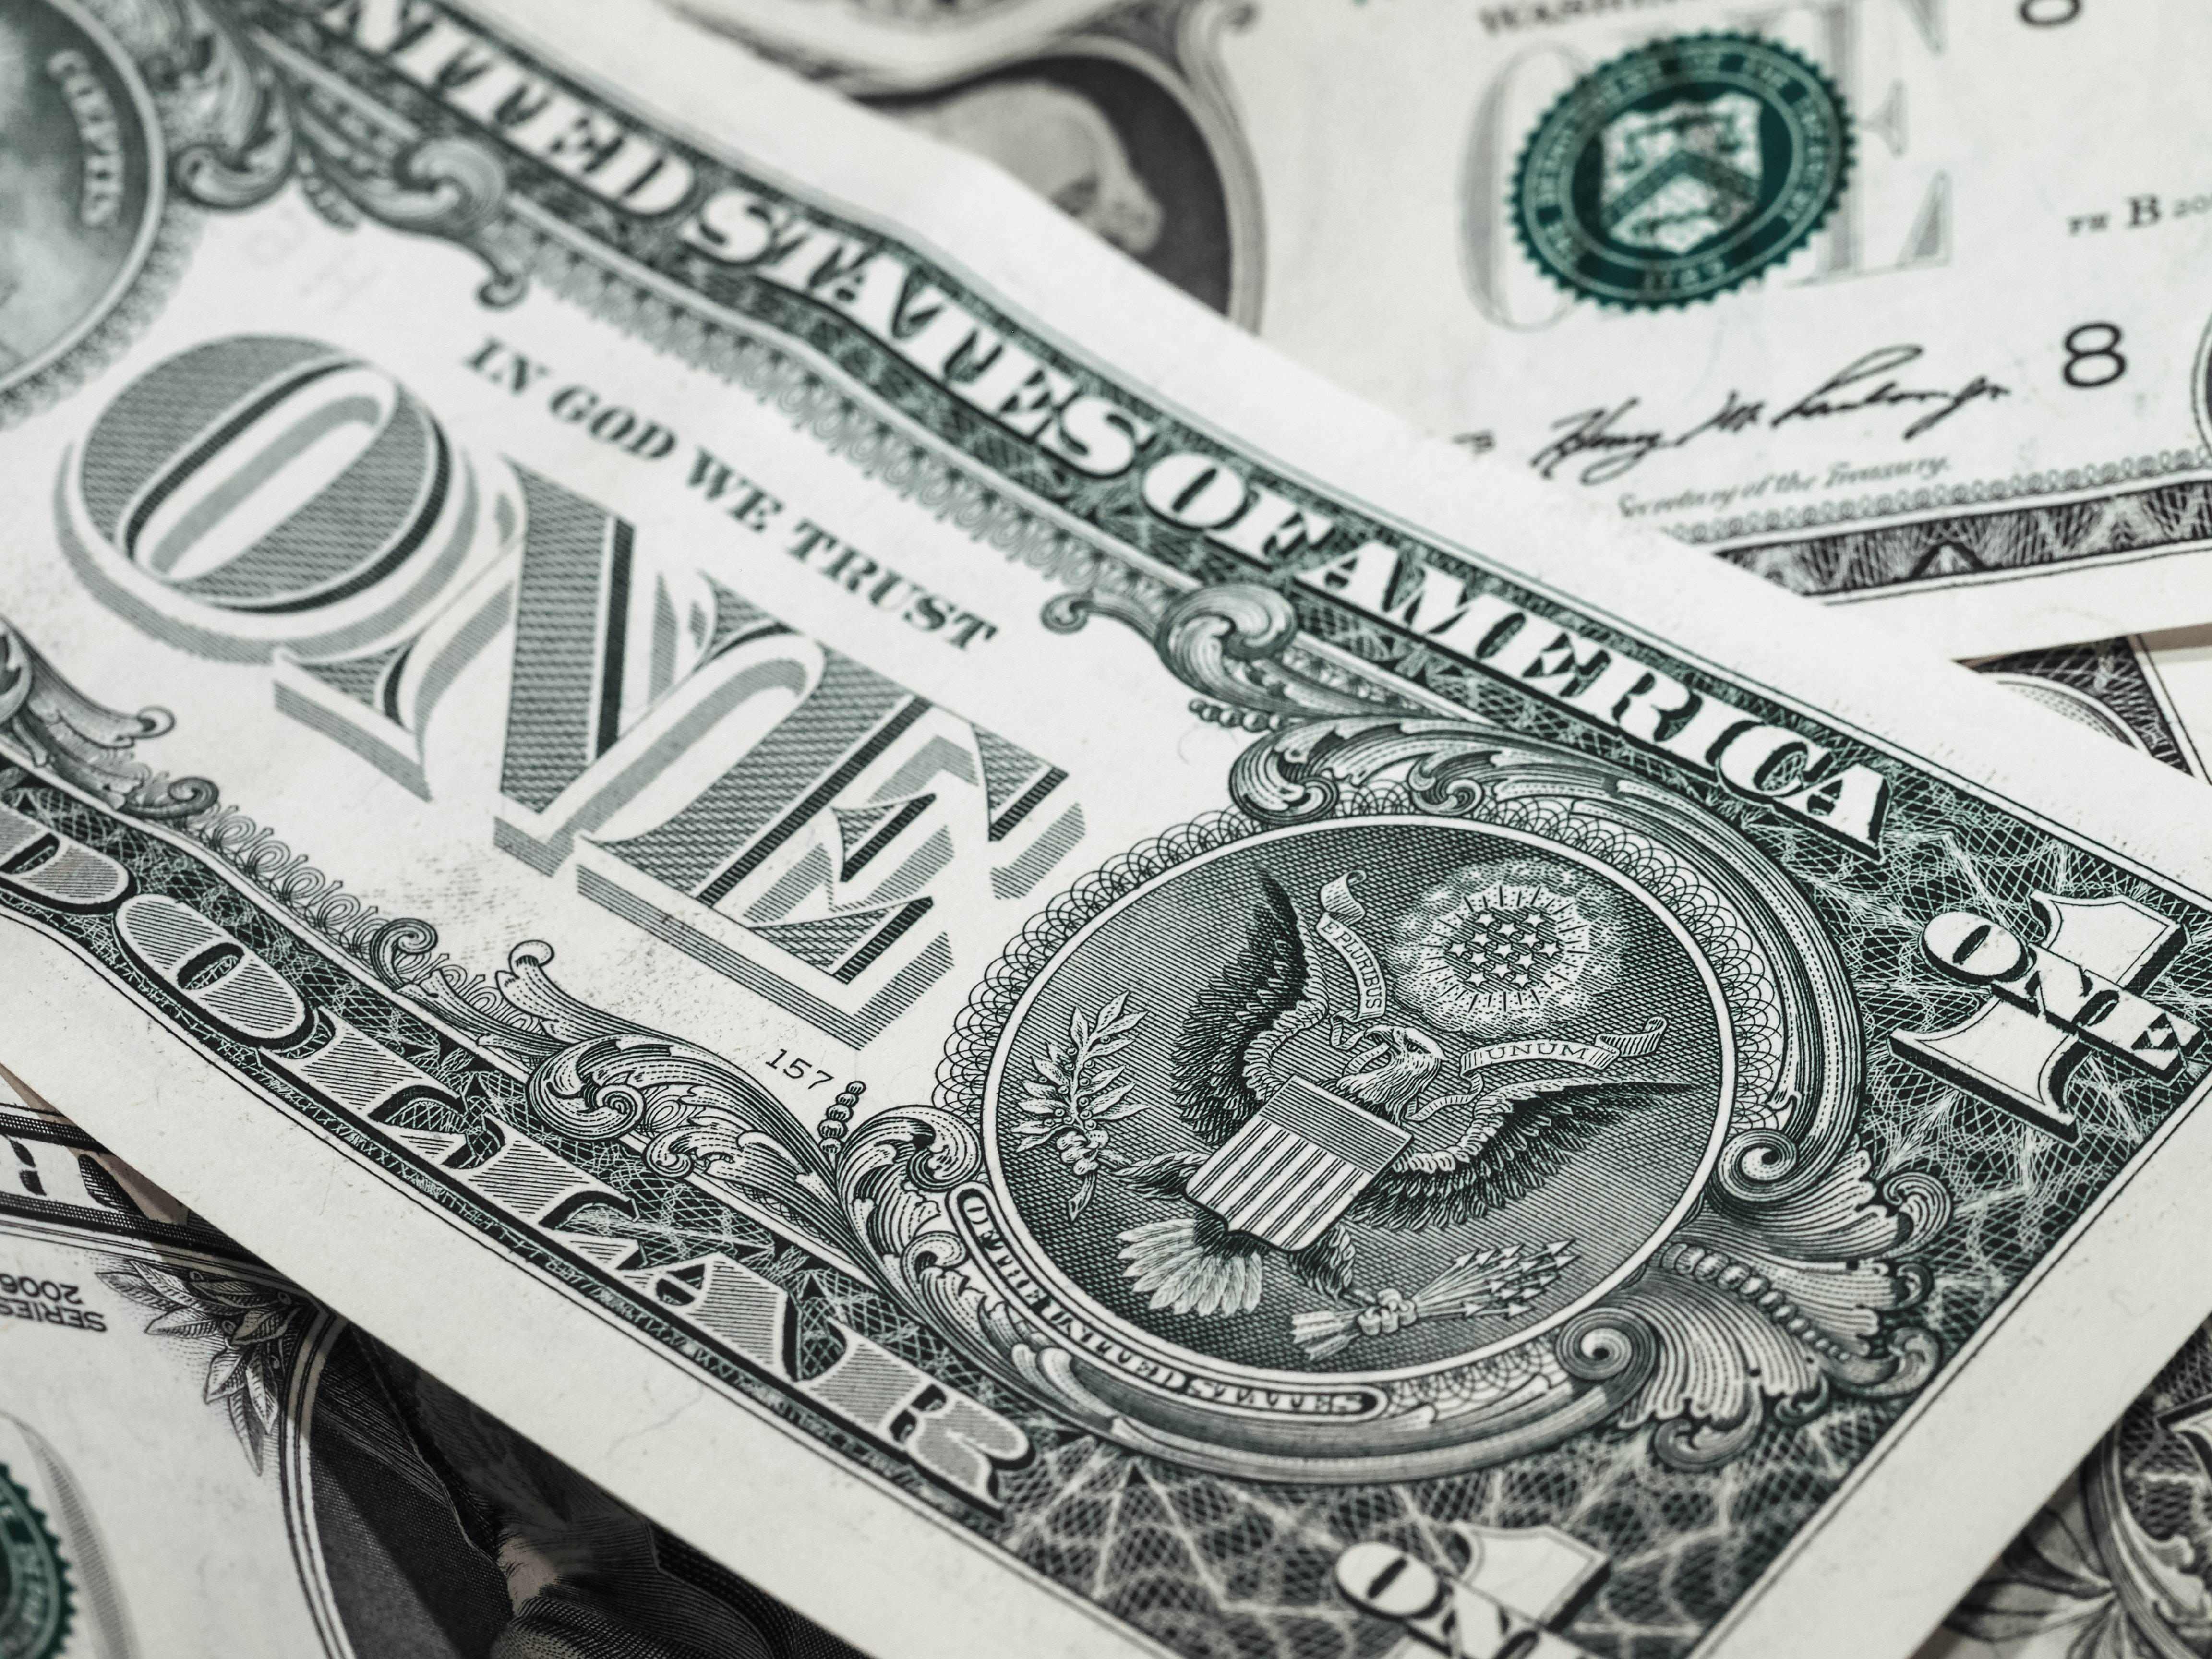 1 U.s. Dollar Bill, Bank note, Loan, Us-dollar, Savings, HQ Photo